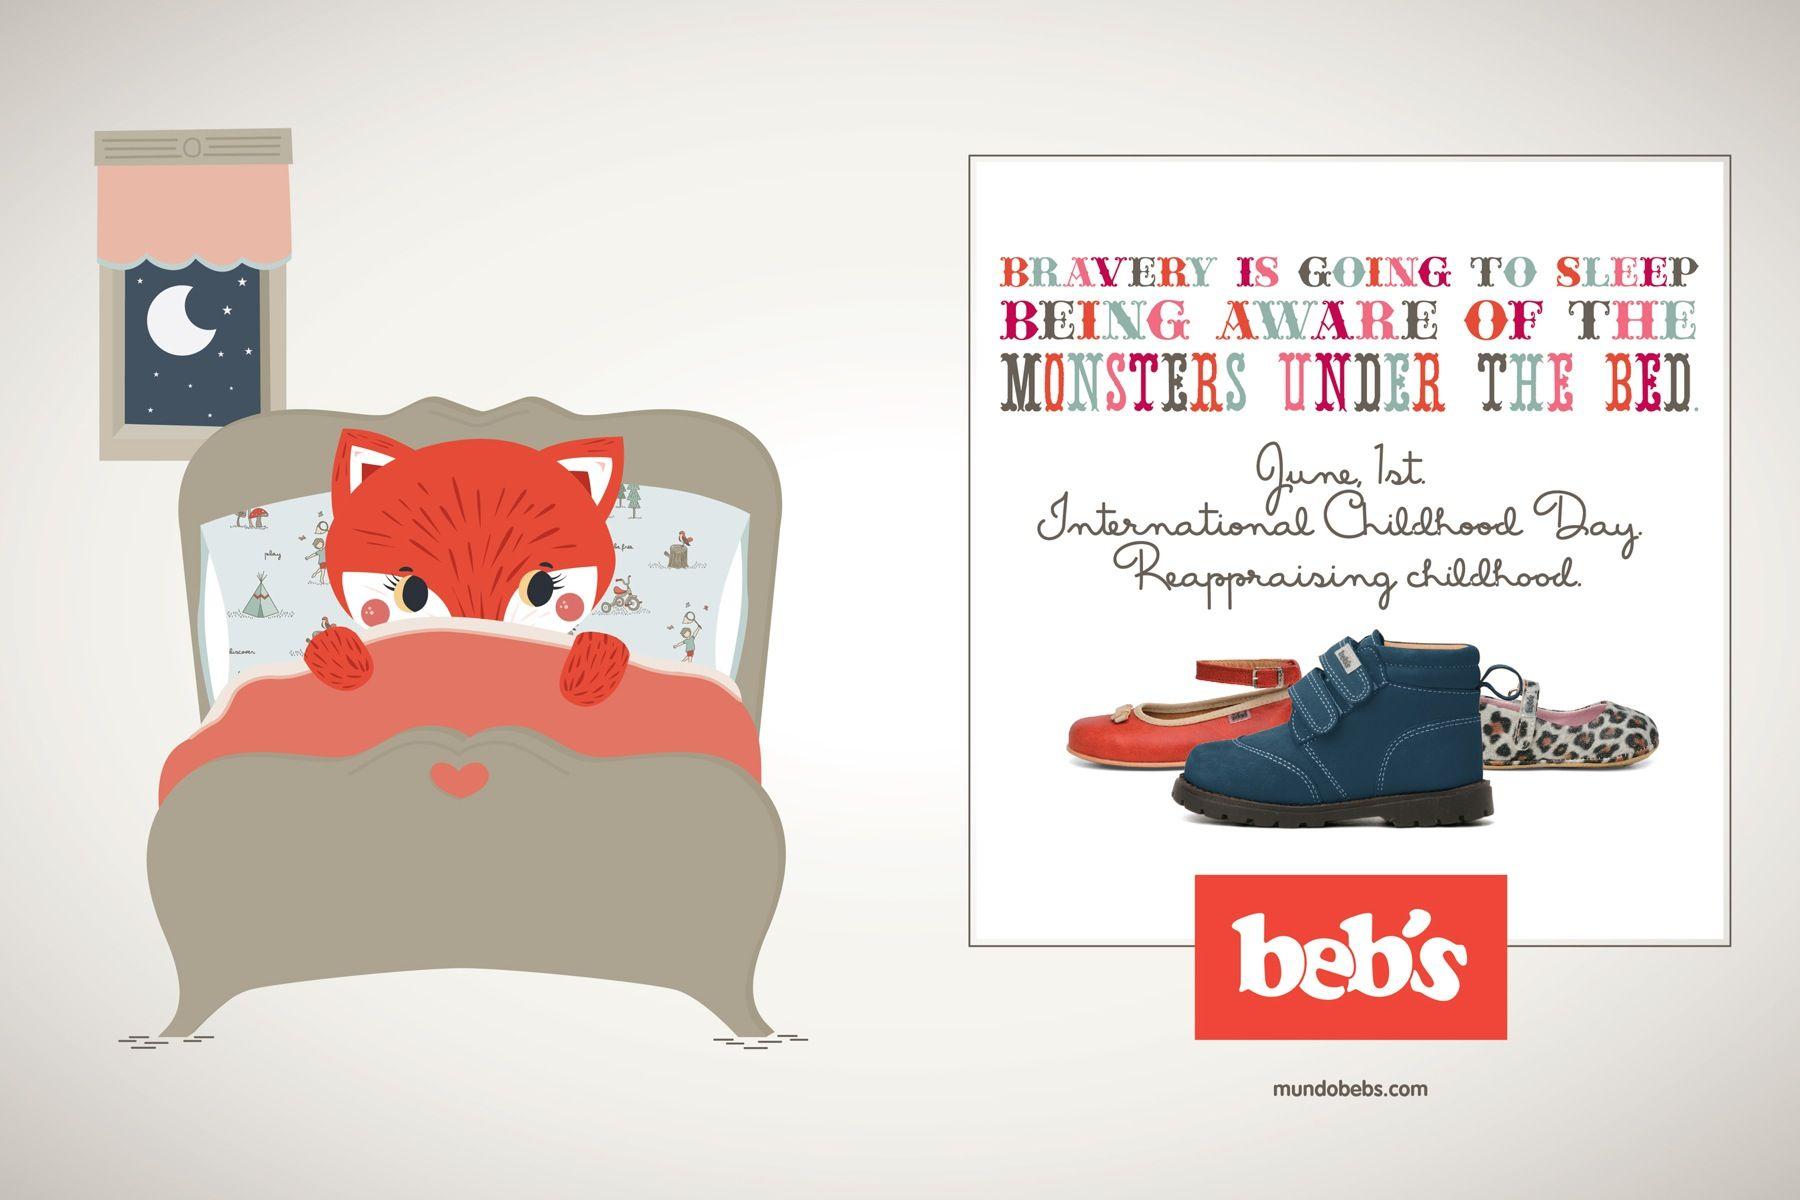 Beb's: International Childhood Day